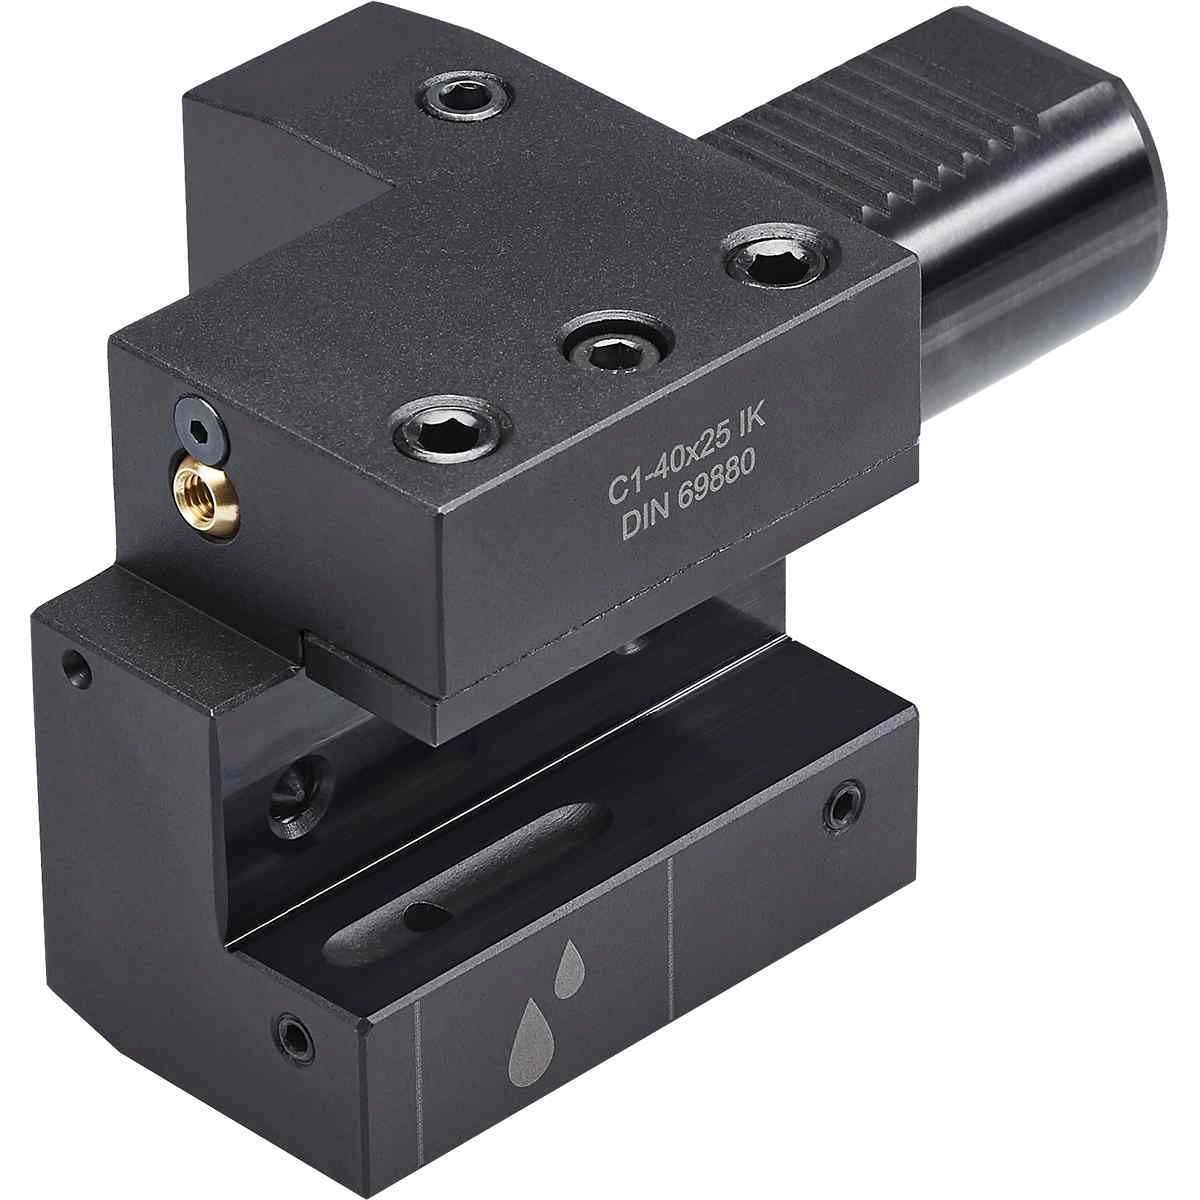 VDI 60 DIN 69880 Form A2 VDI Werkzeughalter-Rohling VDI 16